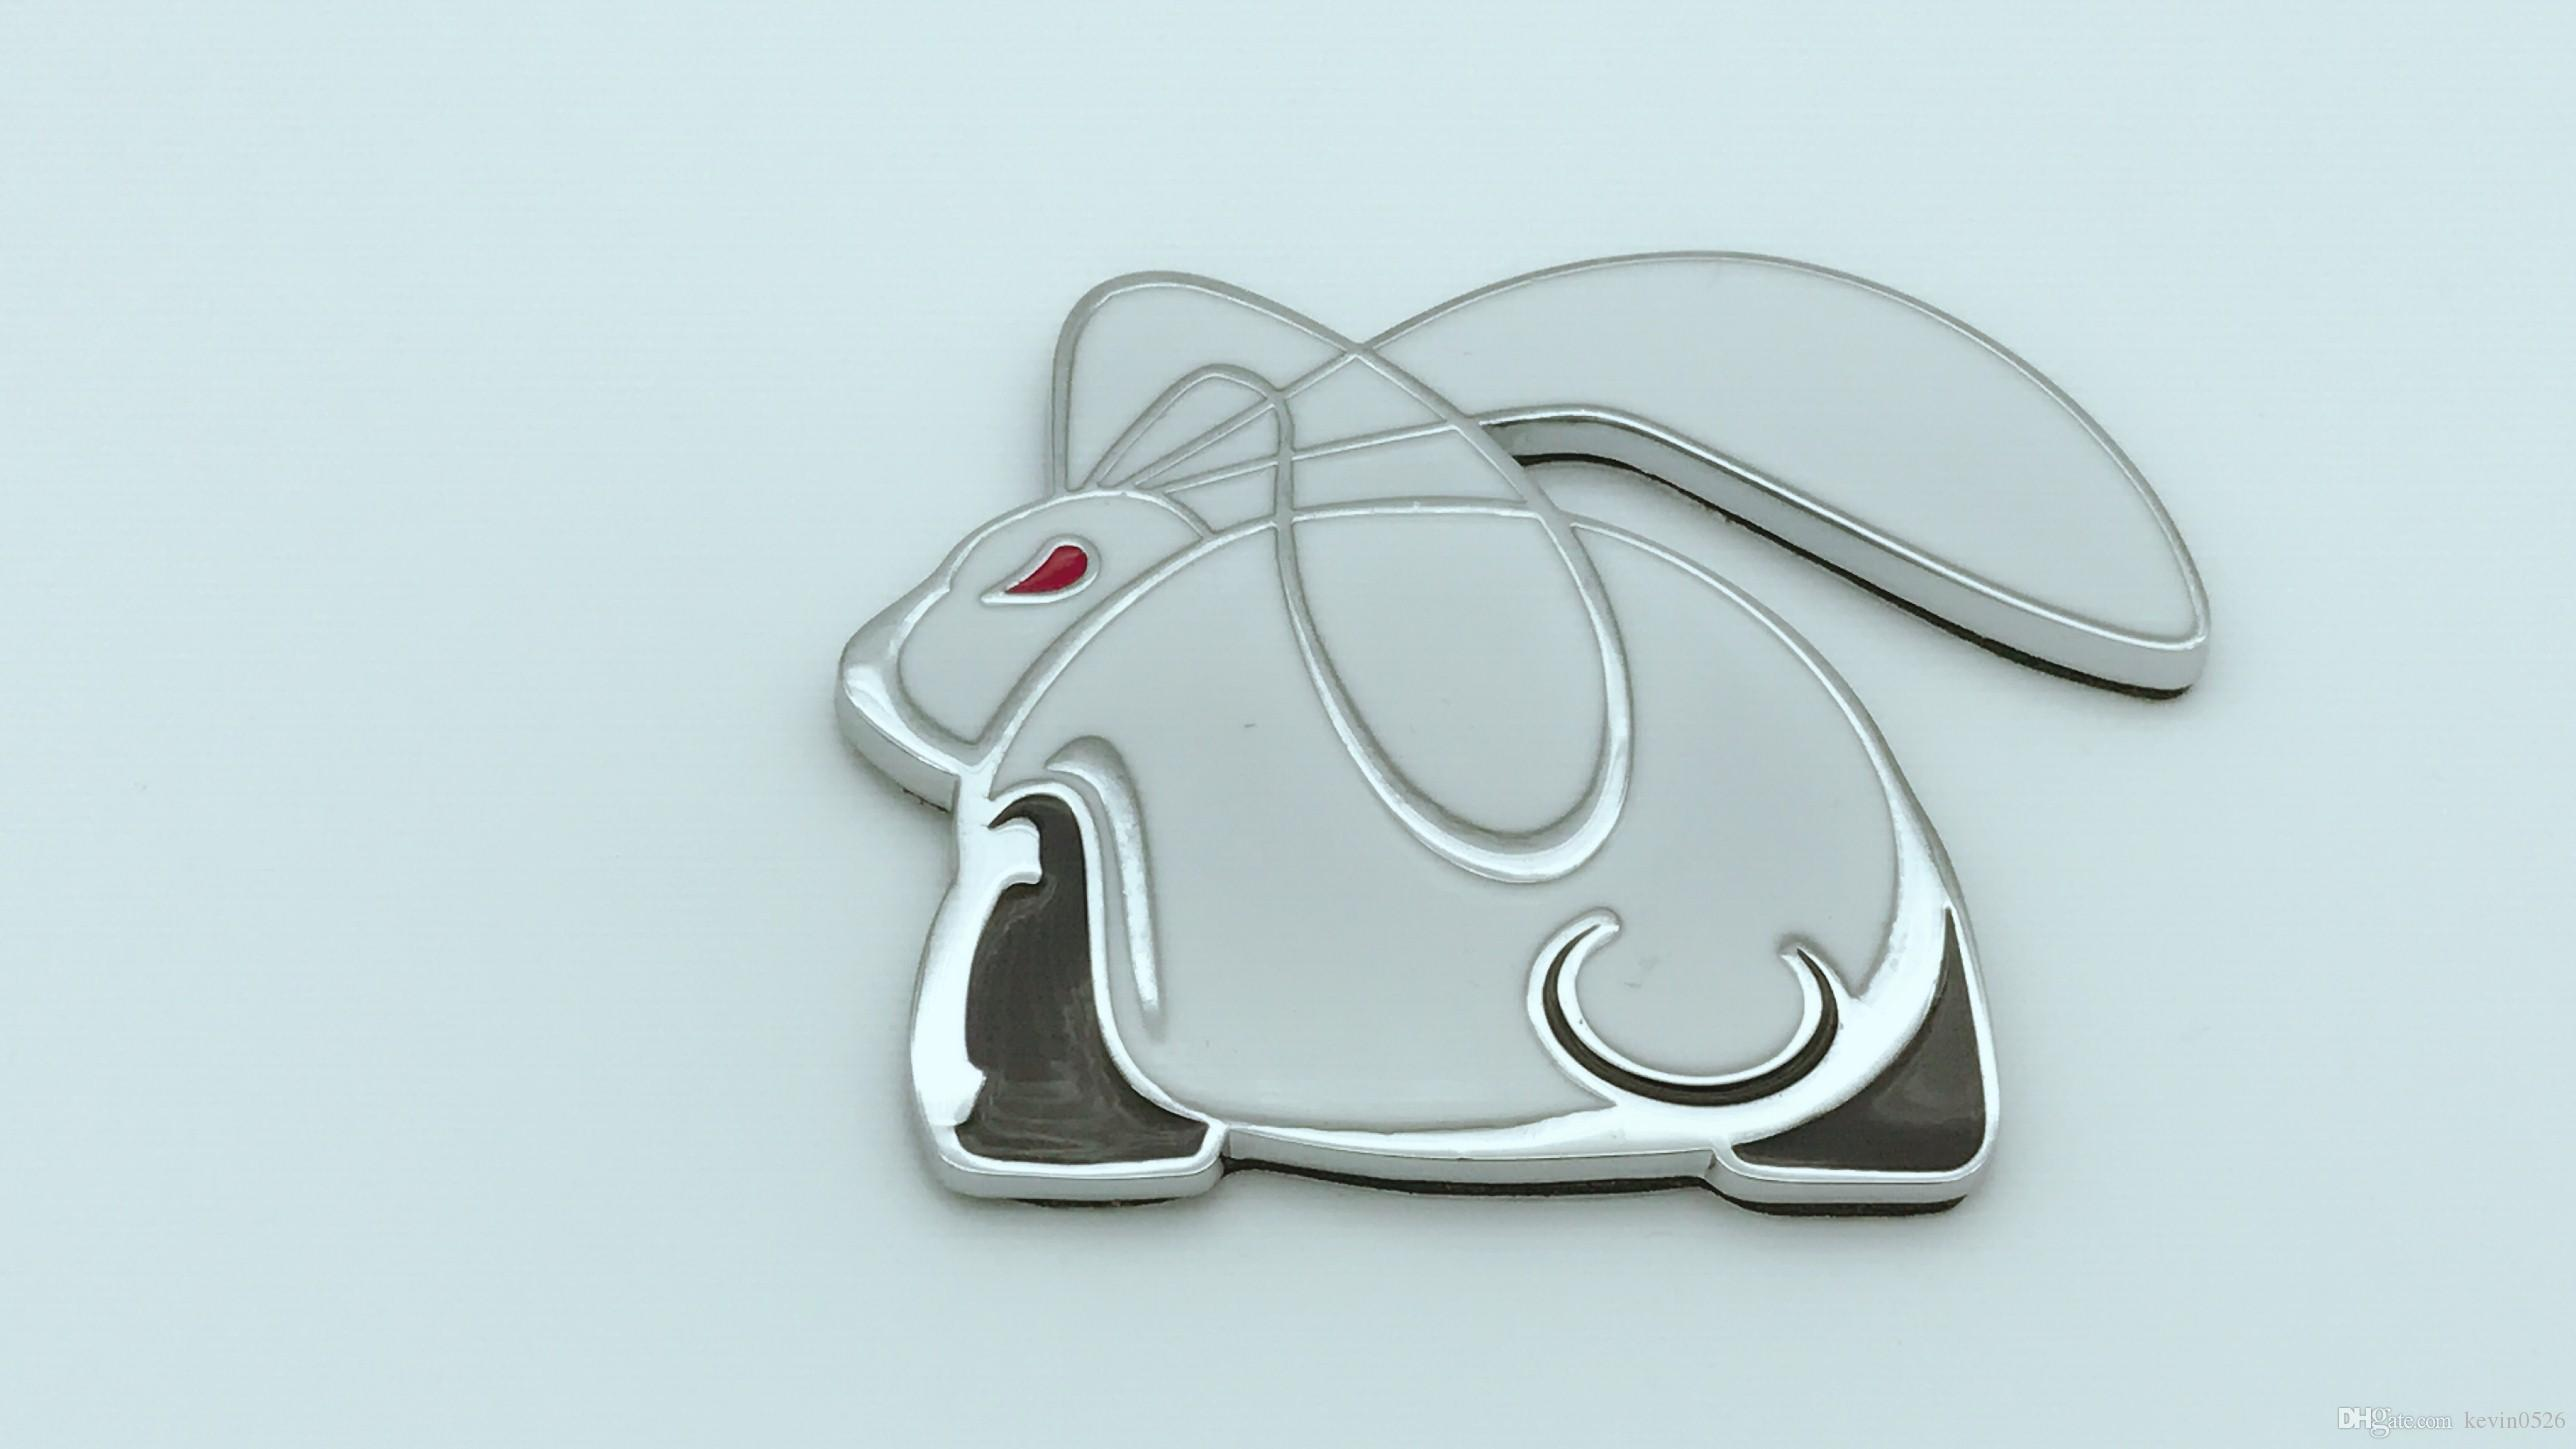 Gti racing evil rabbit chrome metal car sticker emblems for vwvw golf mk6 cc scirocco side panel car decals accessory